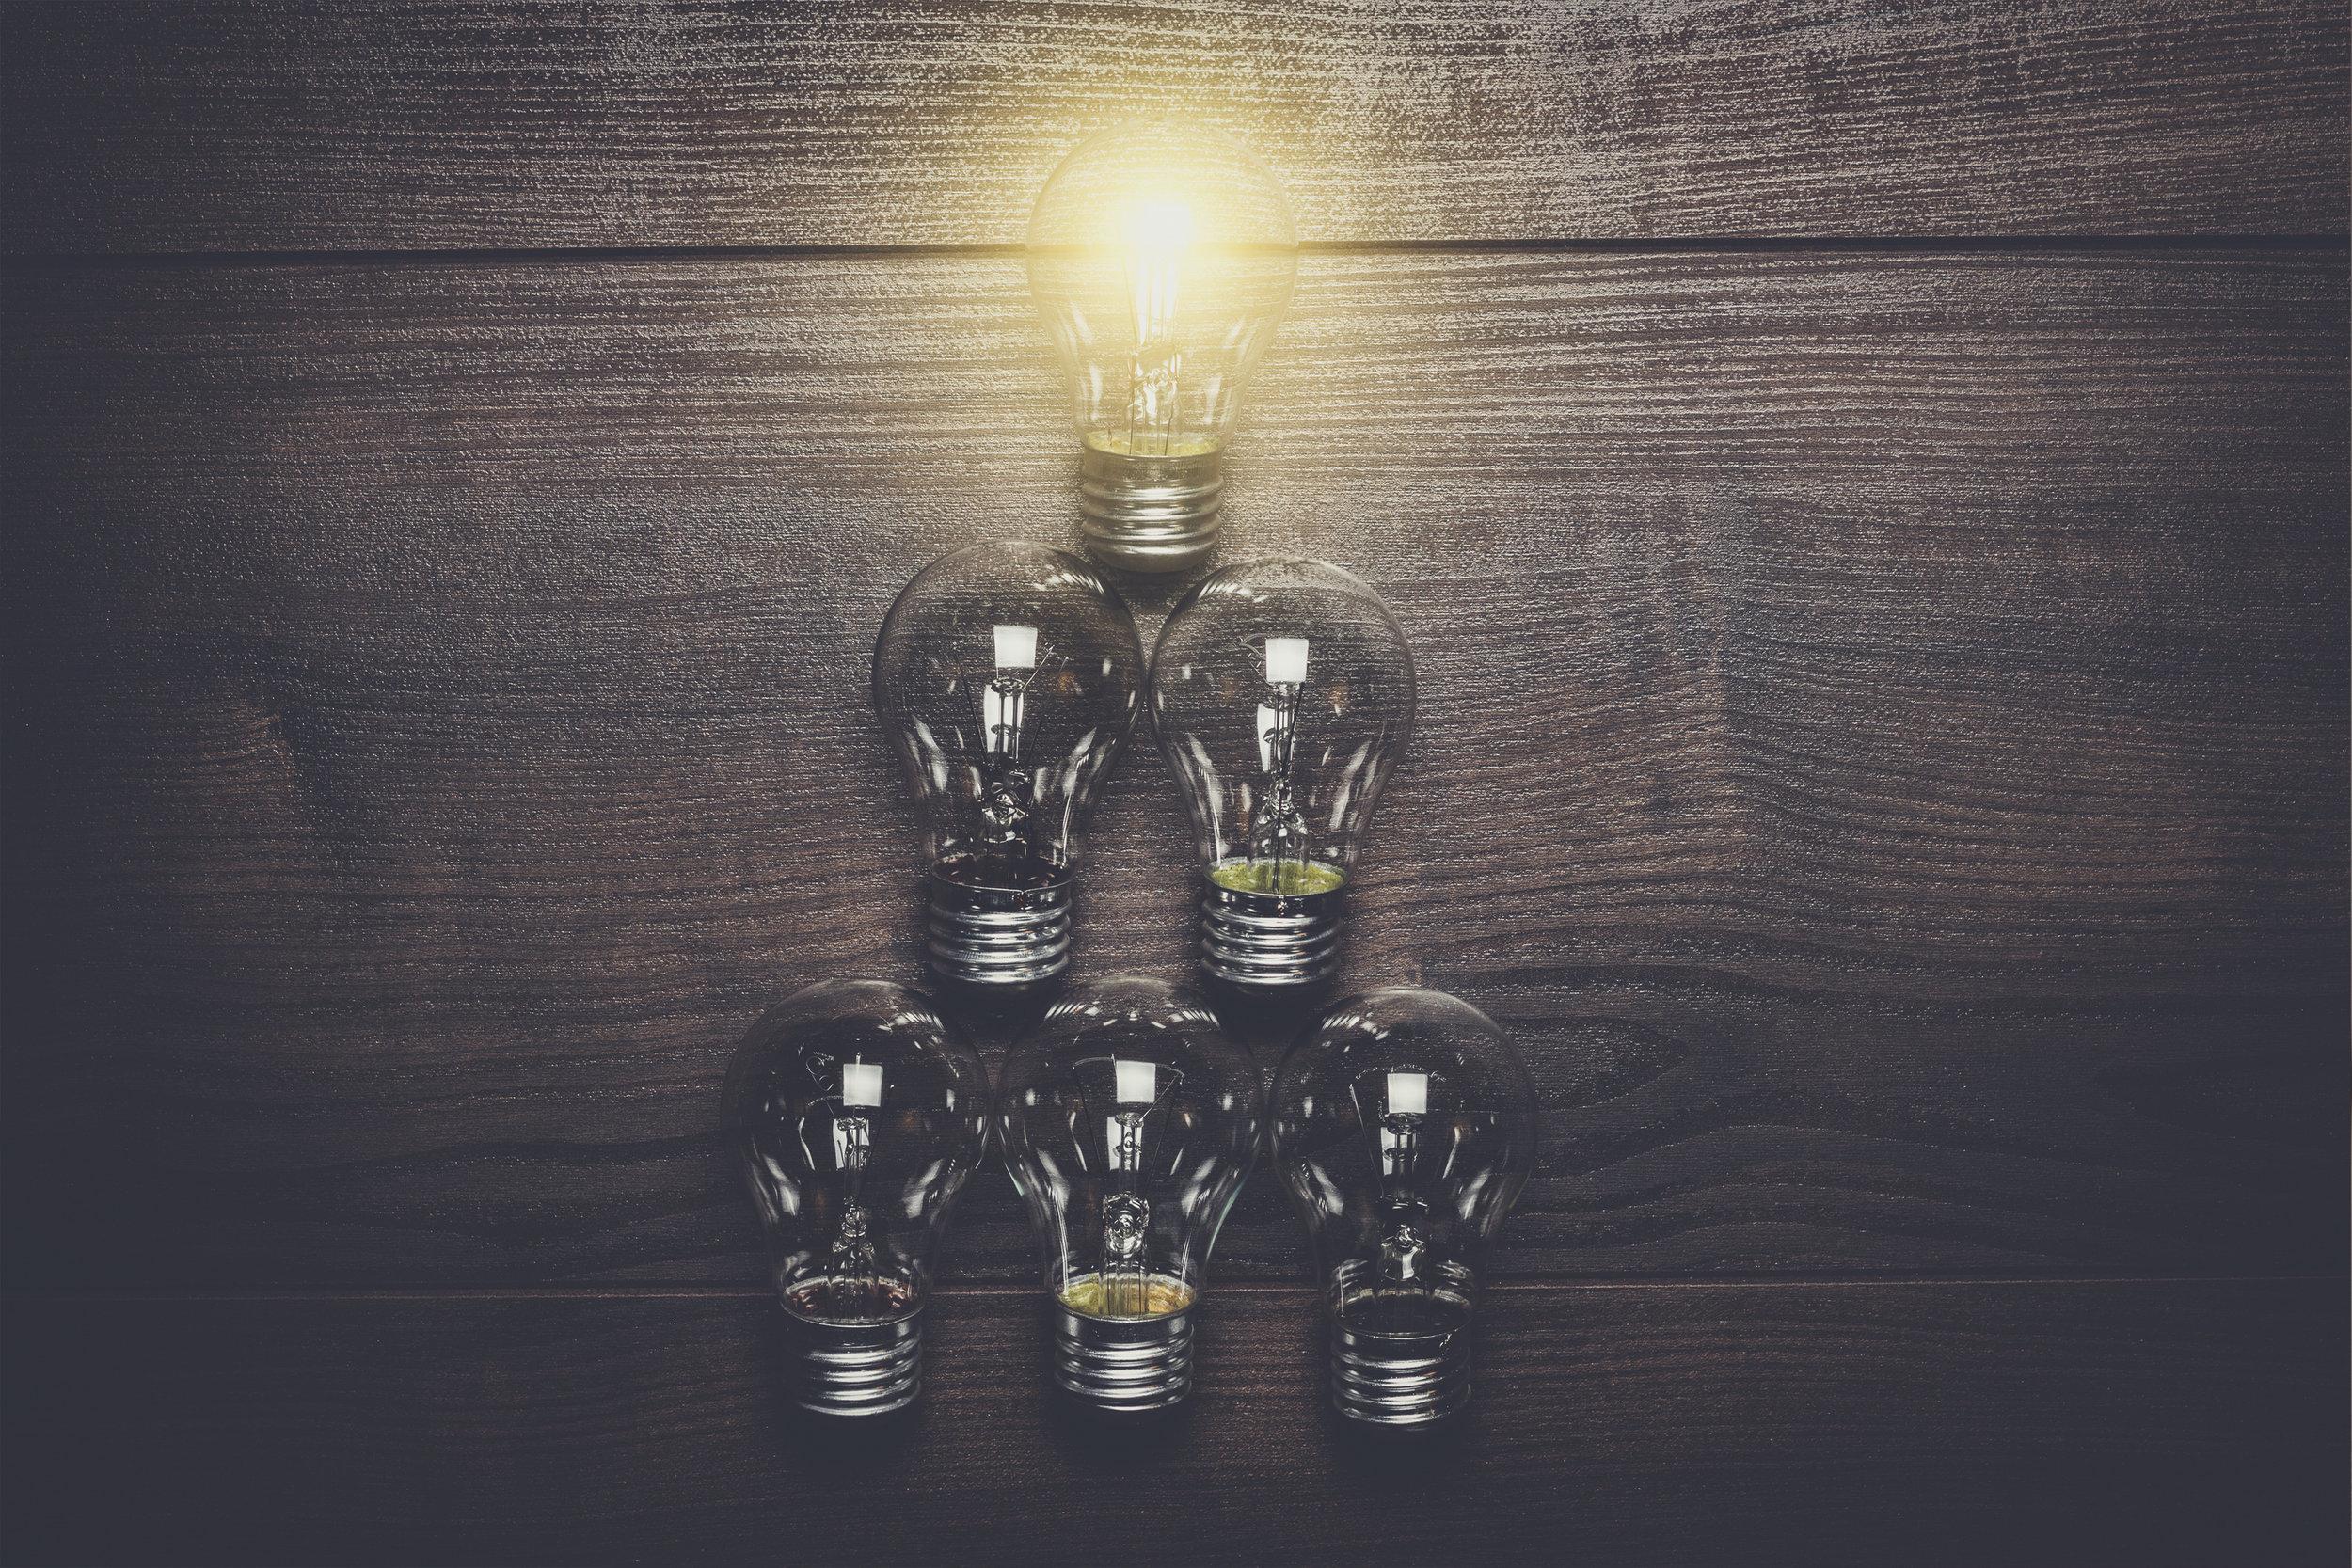 glowing-bulb-leadership-concept-on-wooden-P3EM87M.jpg